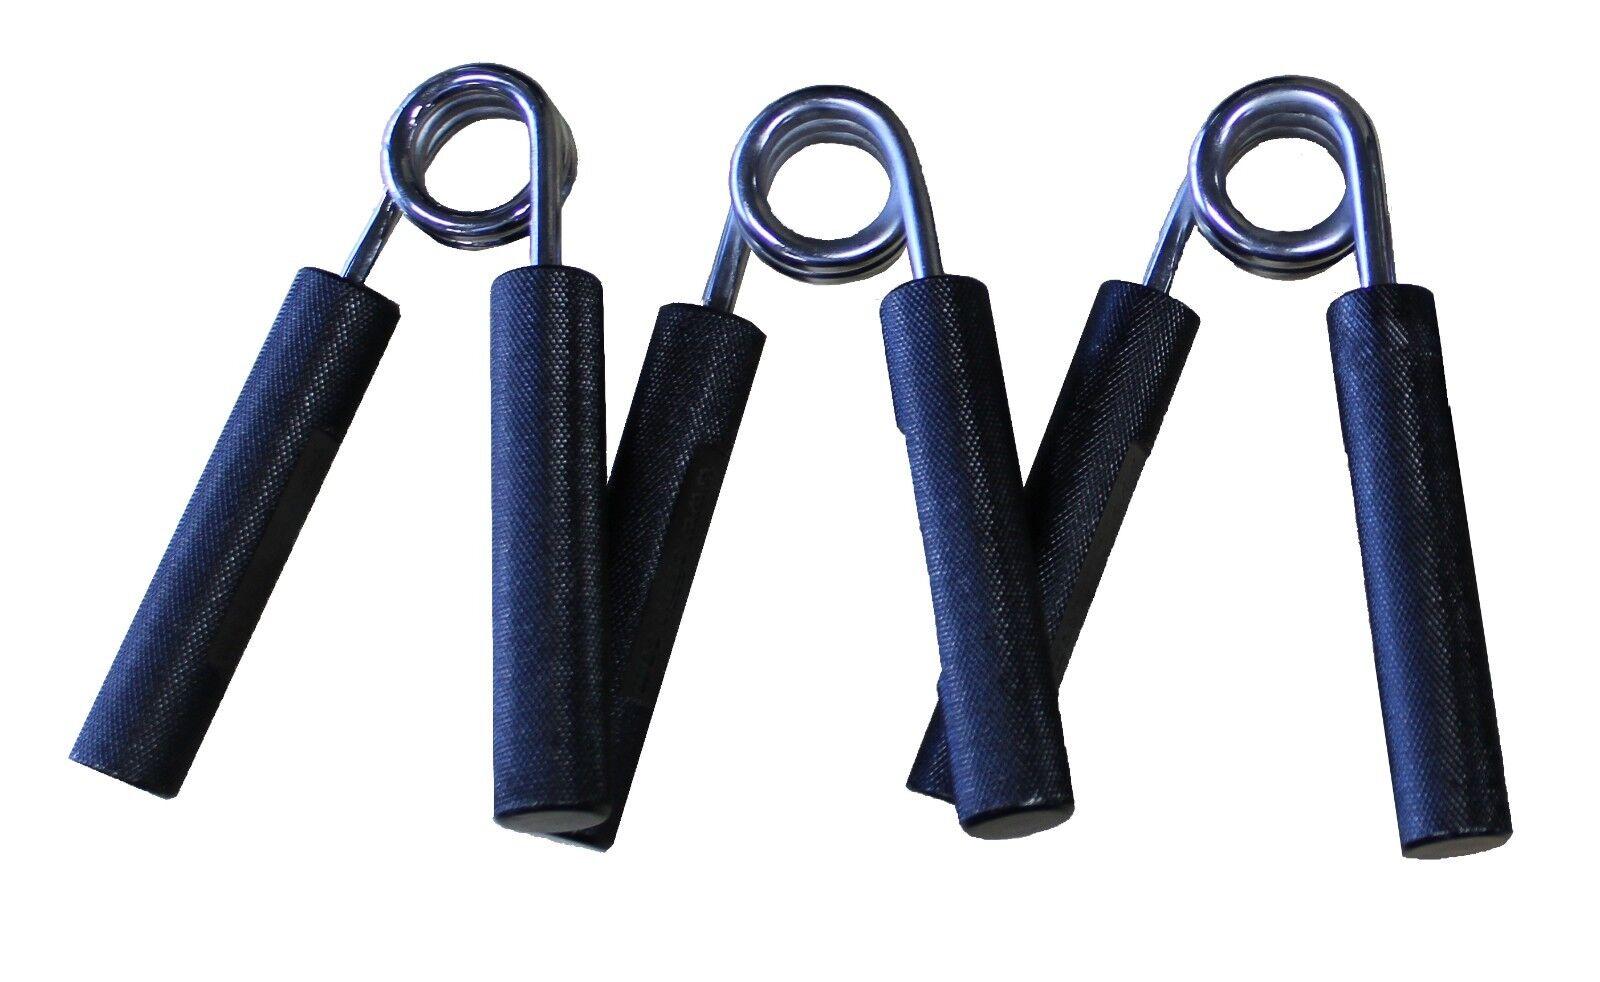 CFF Pit Bull Gripper - Intermediate Set (150lb, 200lb, 250lb)